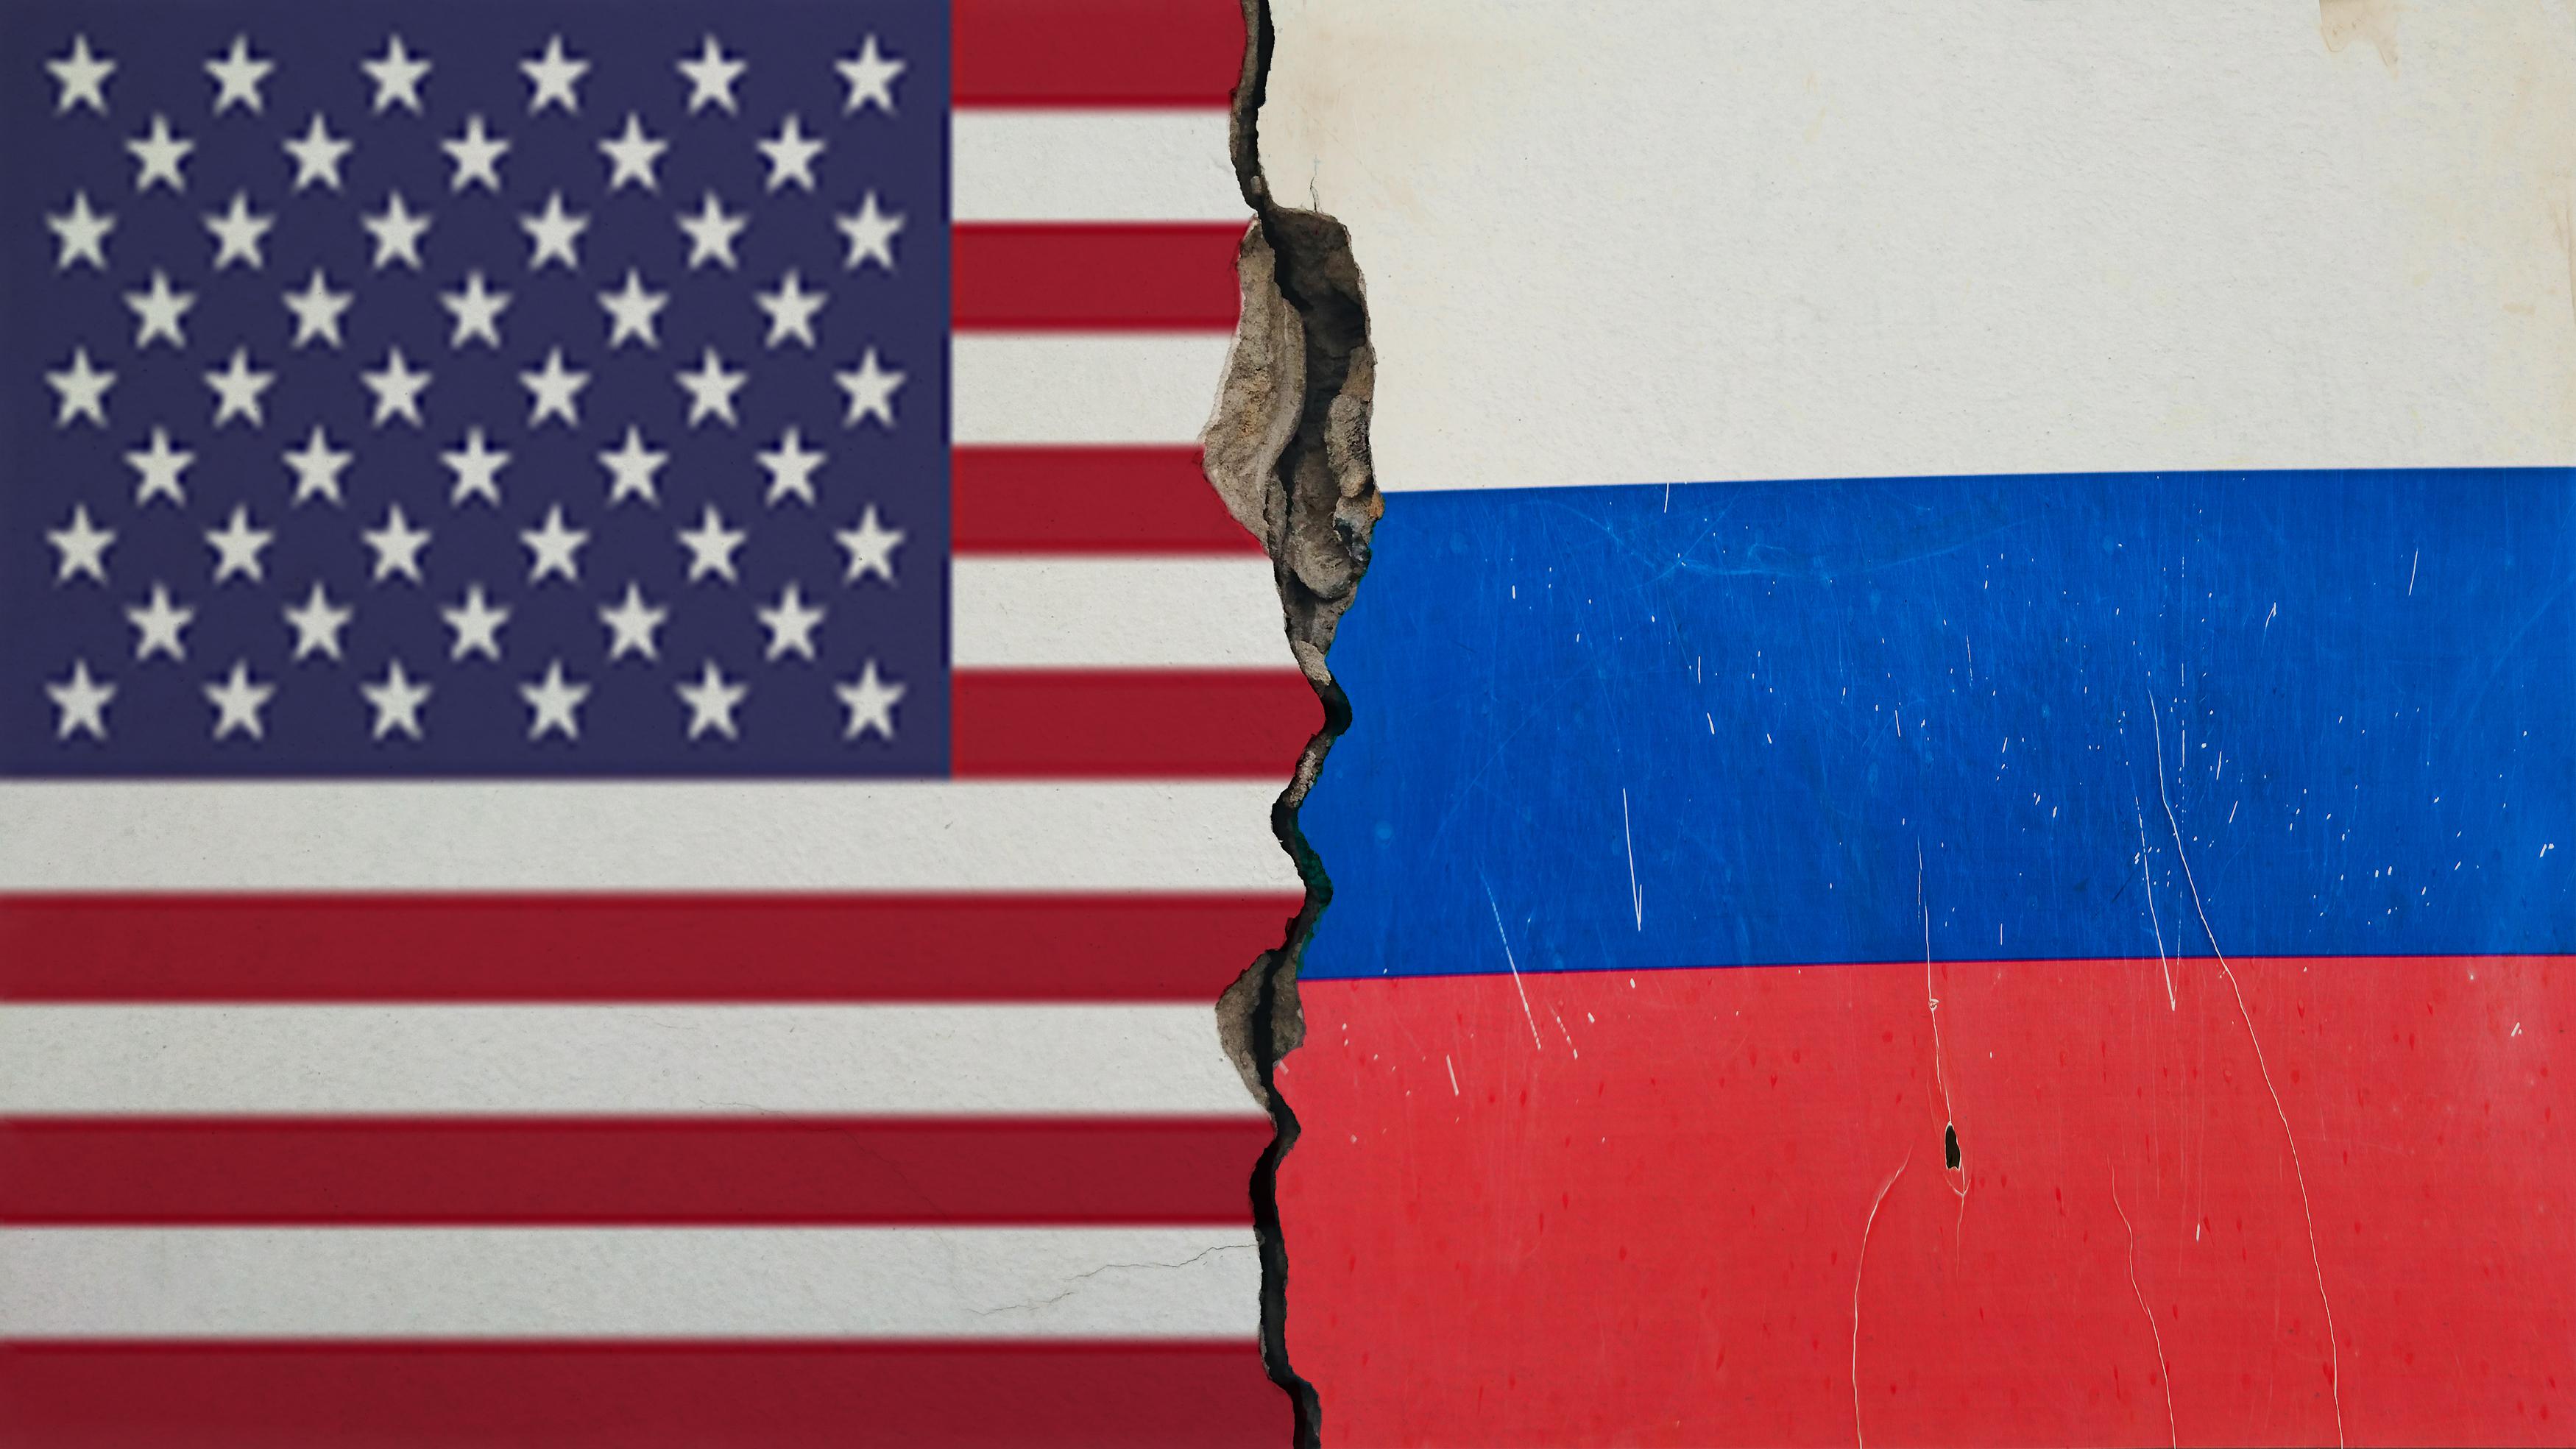 Русия готви ответни санкции срещу САЩ